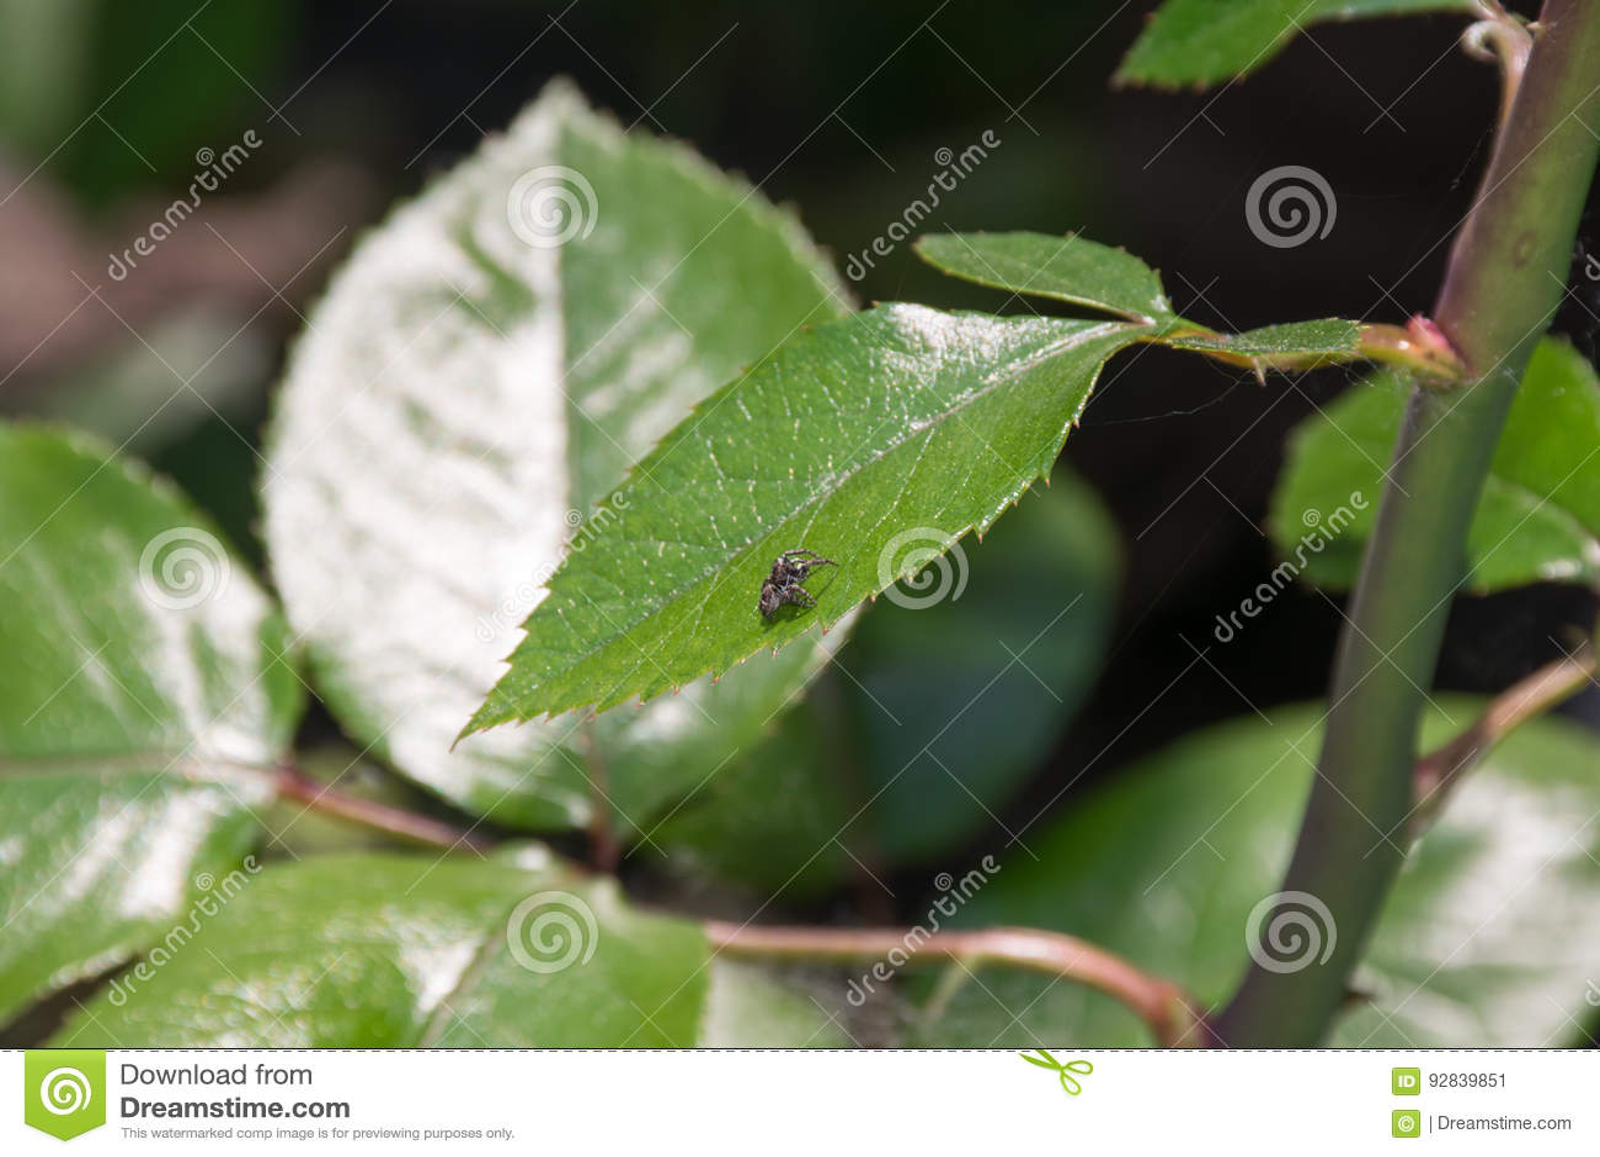 Spinne auf dem Blatt